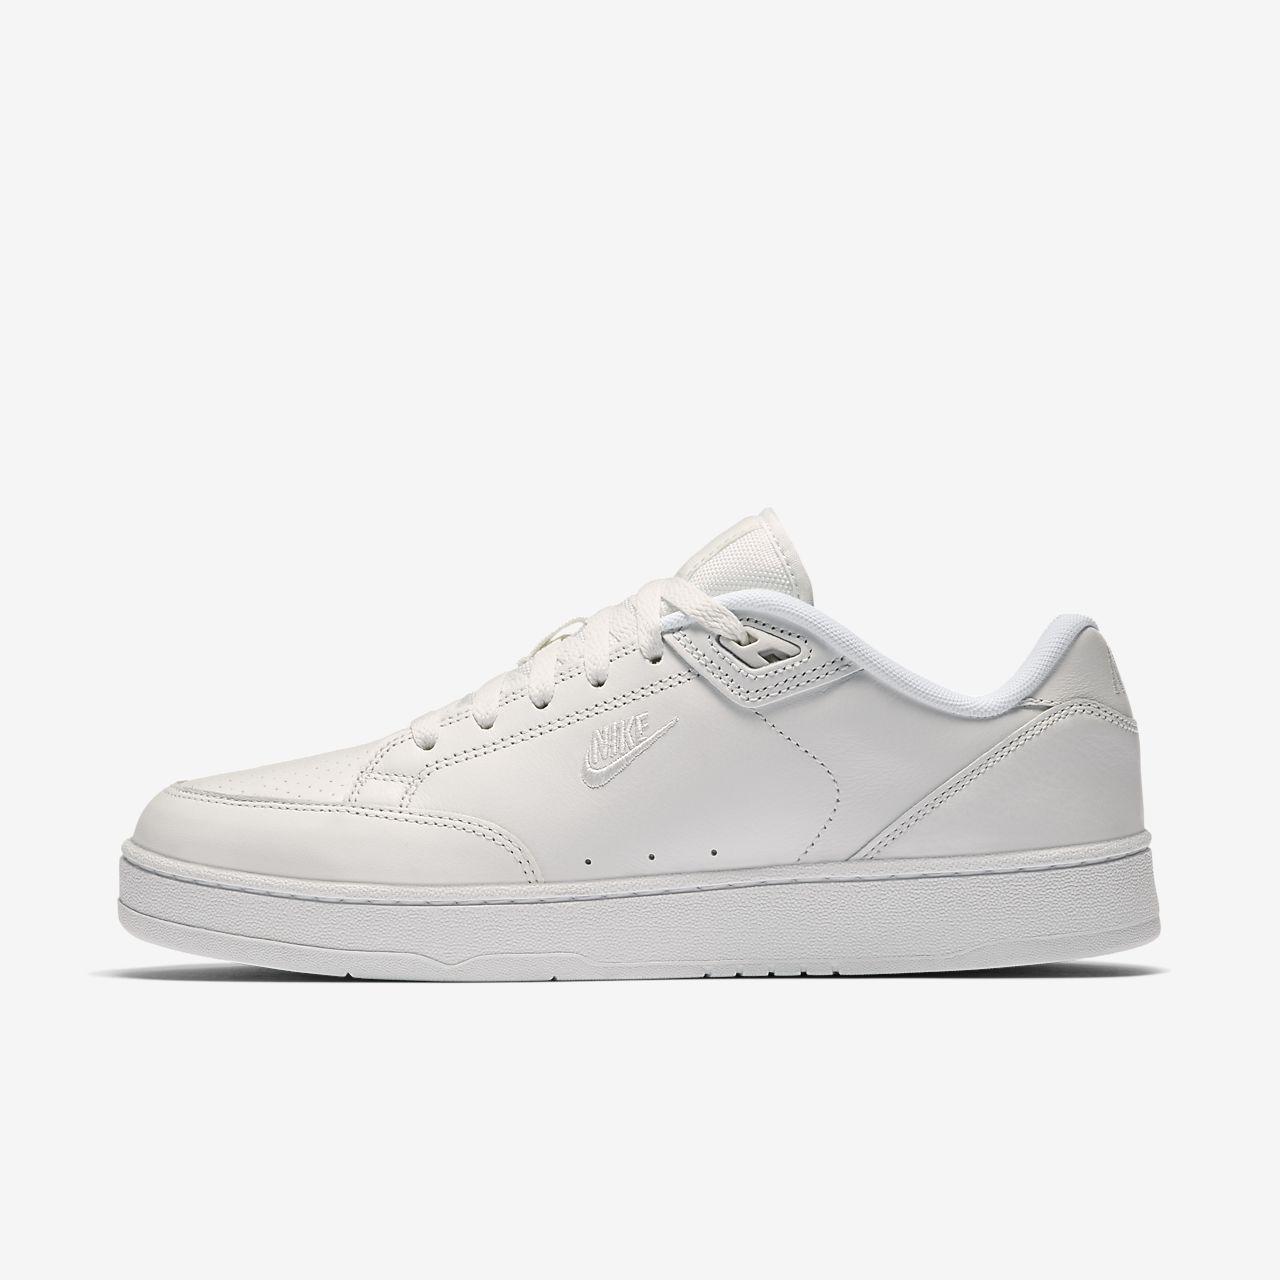 Grandstand Ii Calzado blanco Nike rnR6rpZf